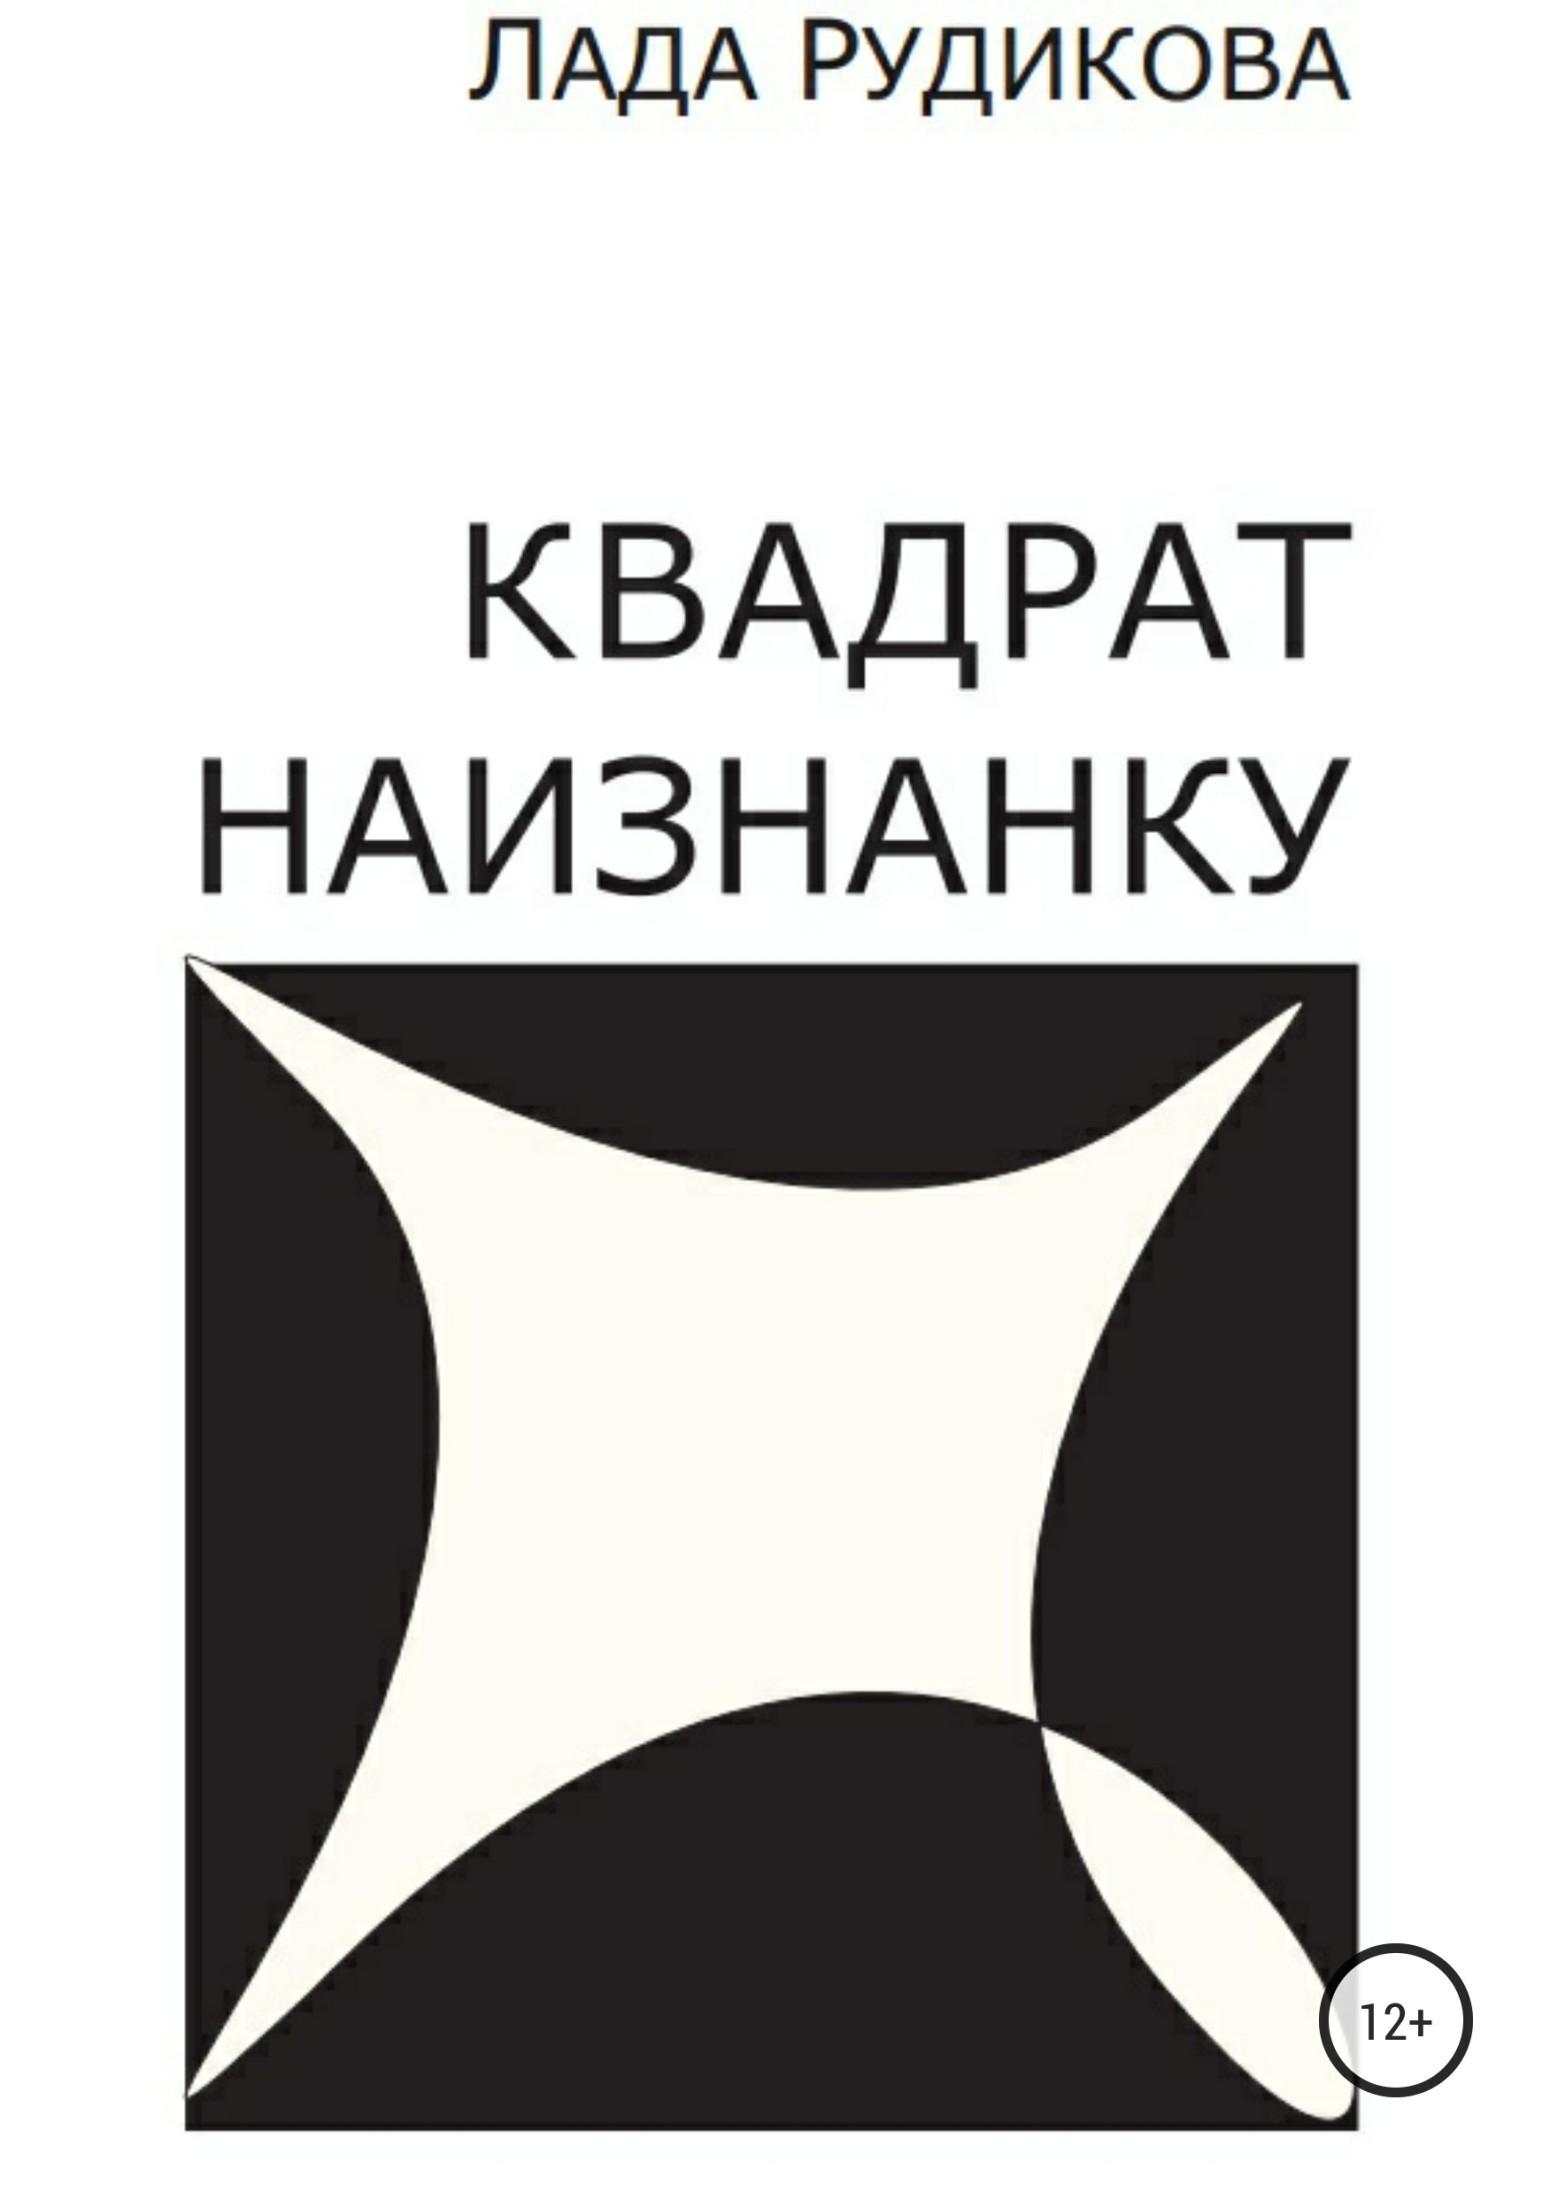 Лада Владимировна Рудикова Квадрат наизнанку